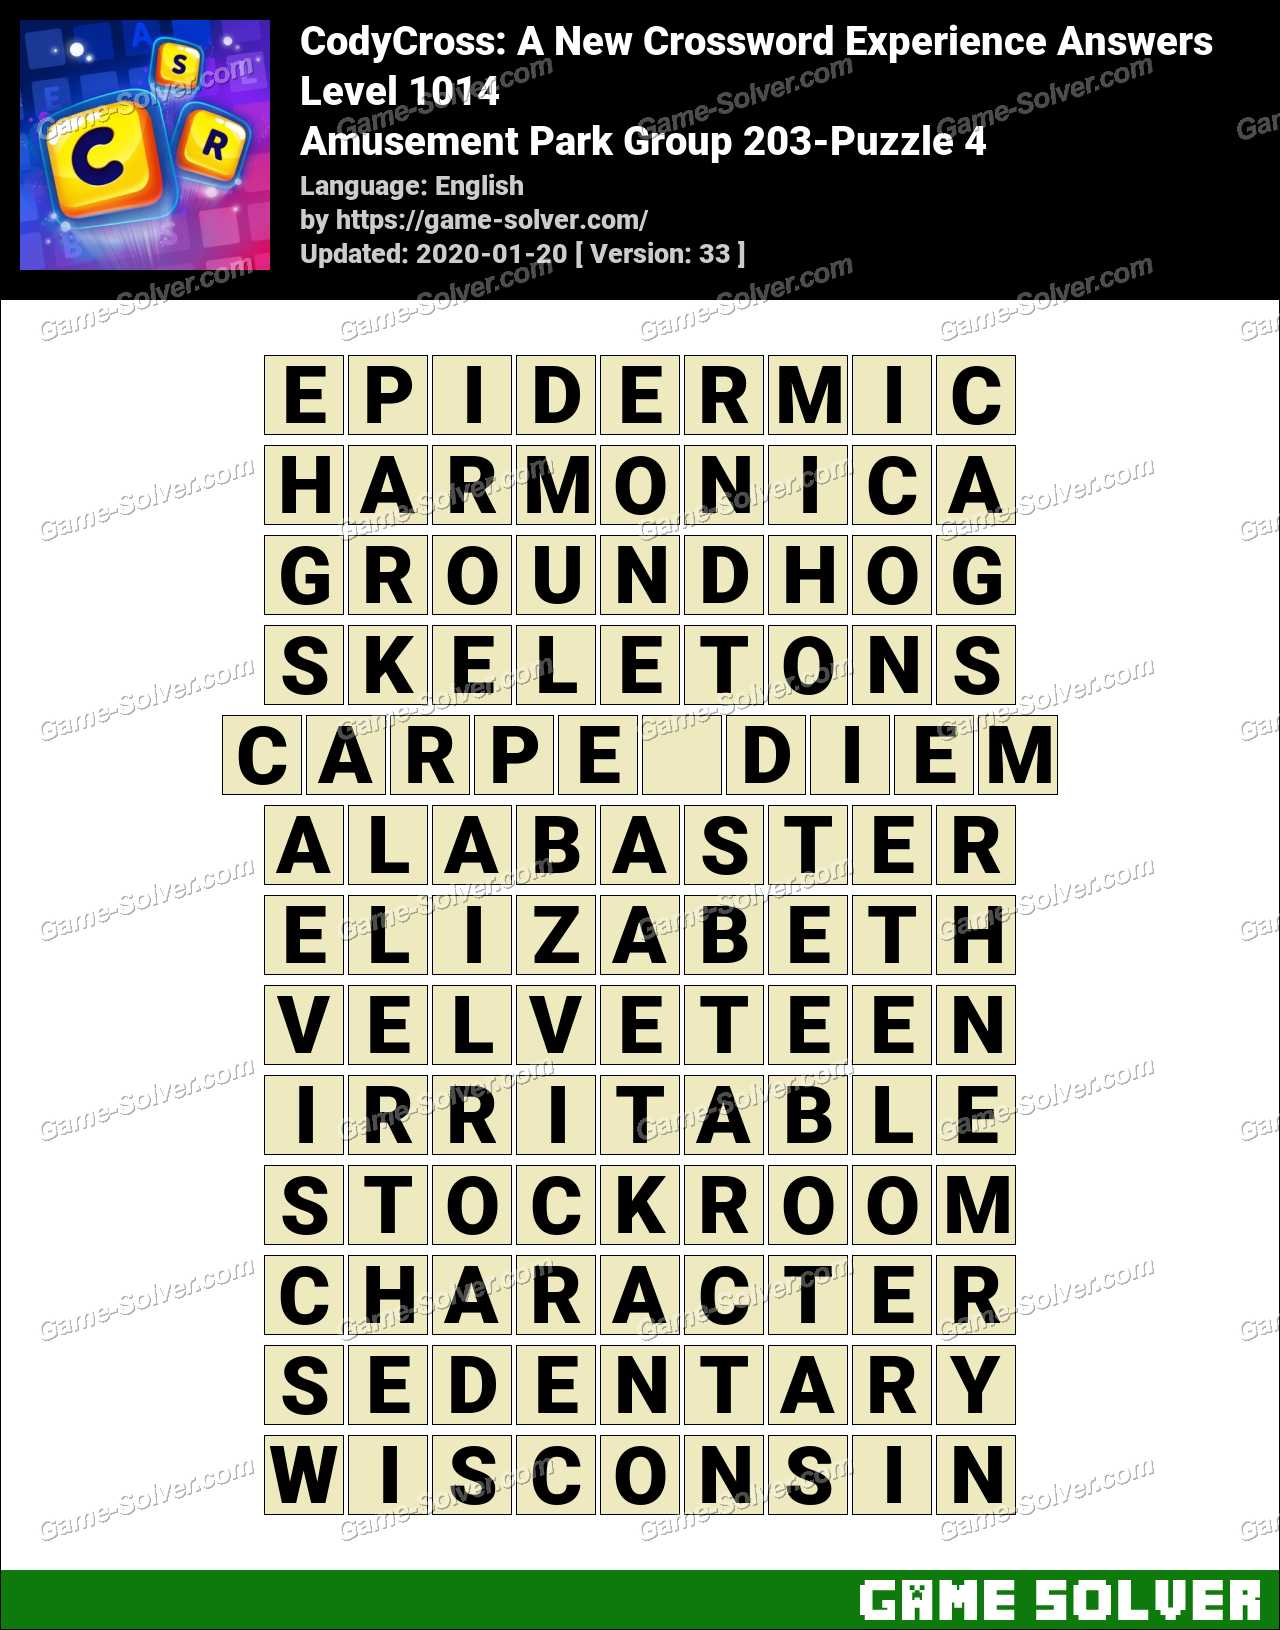 CodyCross Amusement Park Group 203-Puzzle 4 Answers